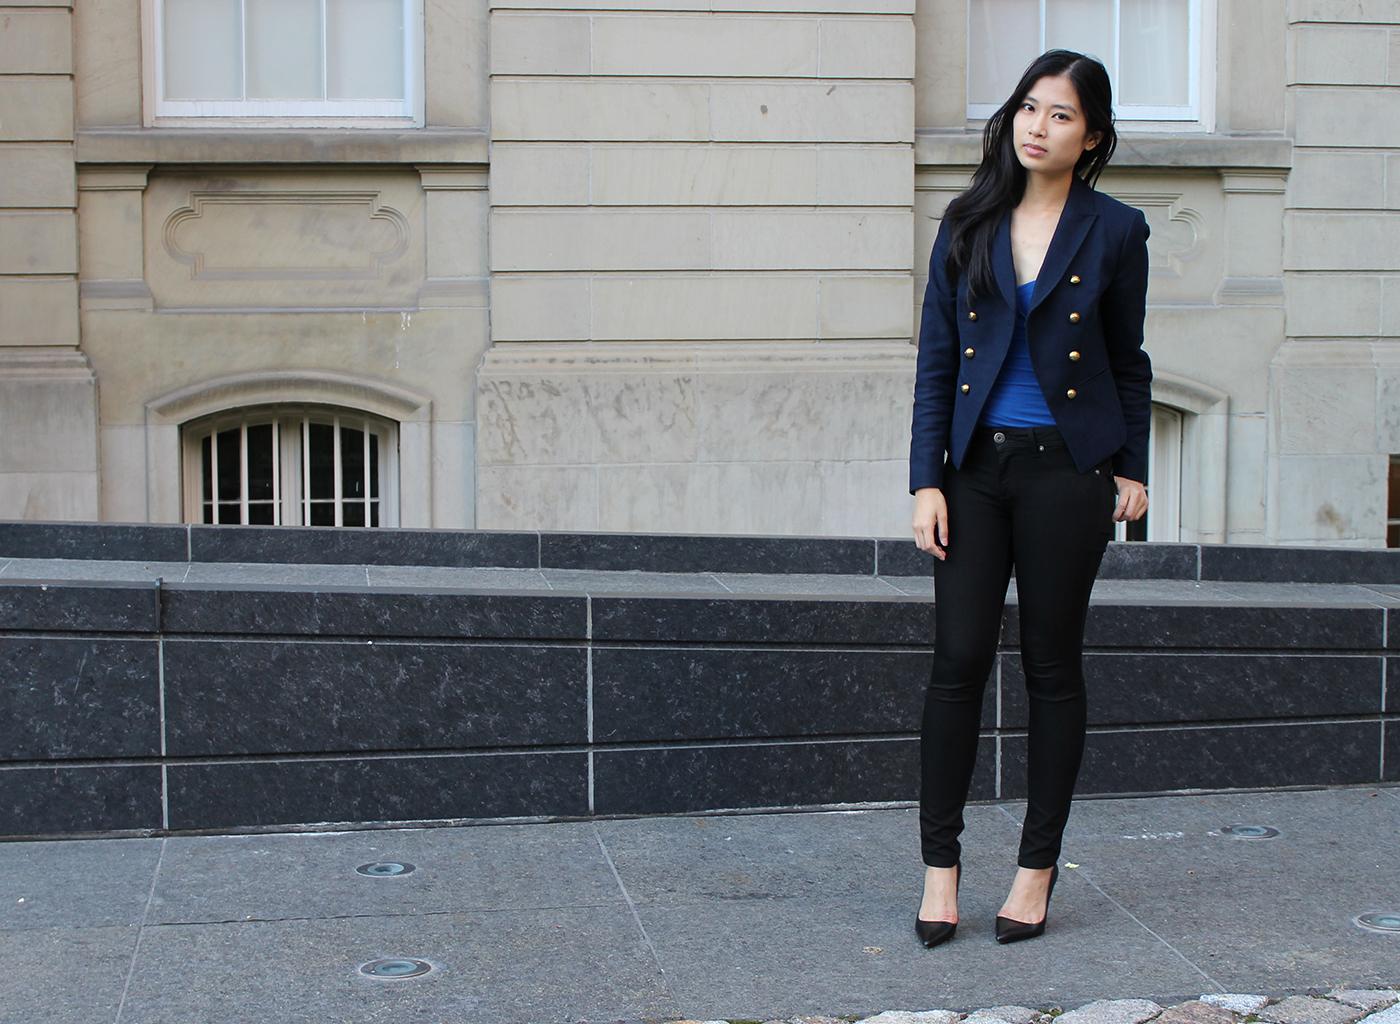 Black dress navy blazer - Wear A Navy Blue Blazer Jacket And Black Skinny Jeans For A Casual Level Of Dress